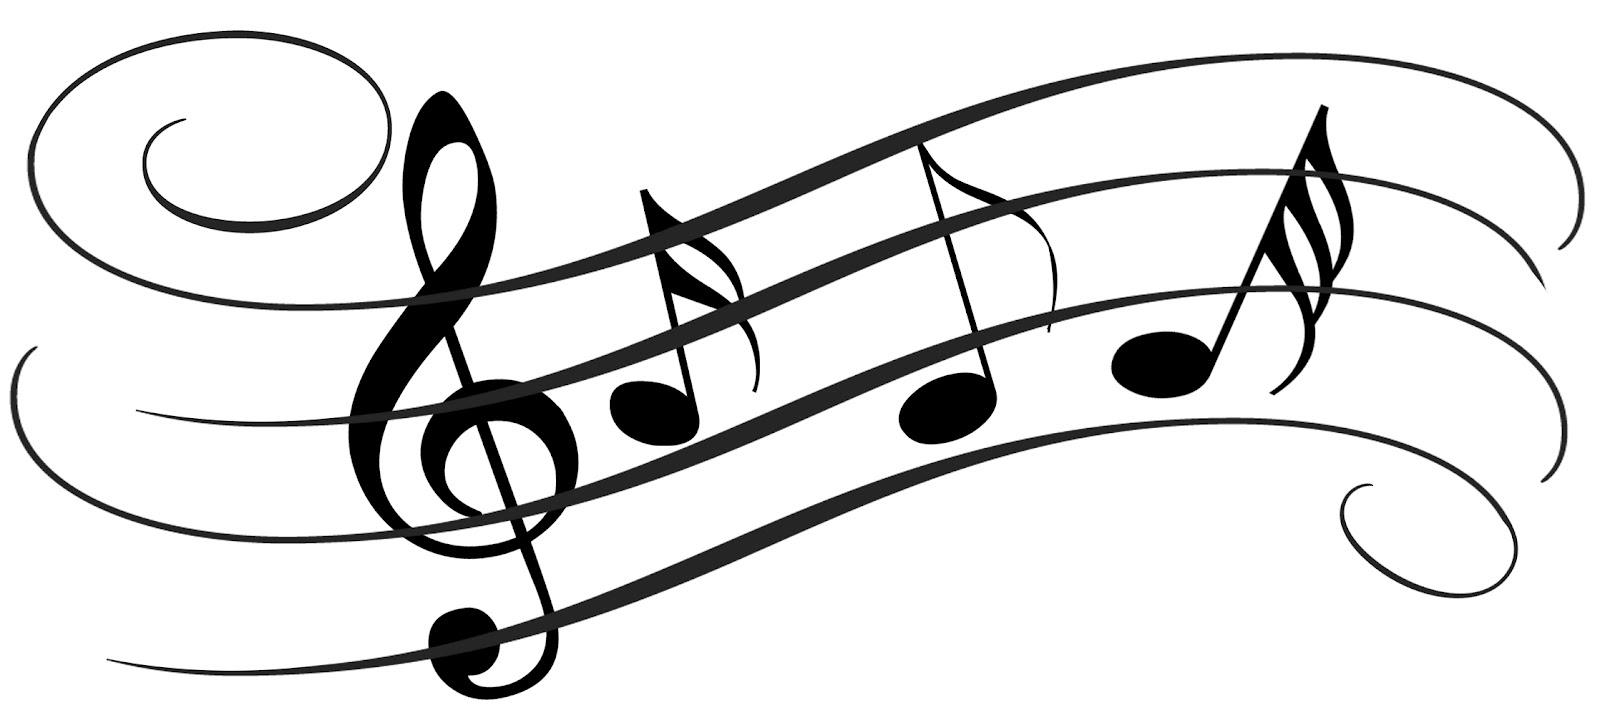 Music Silhouette Clip Art.